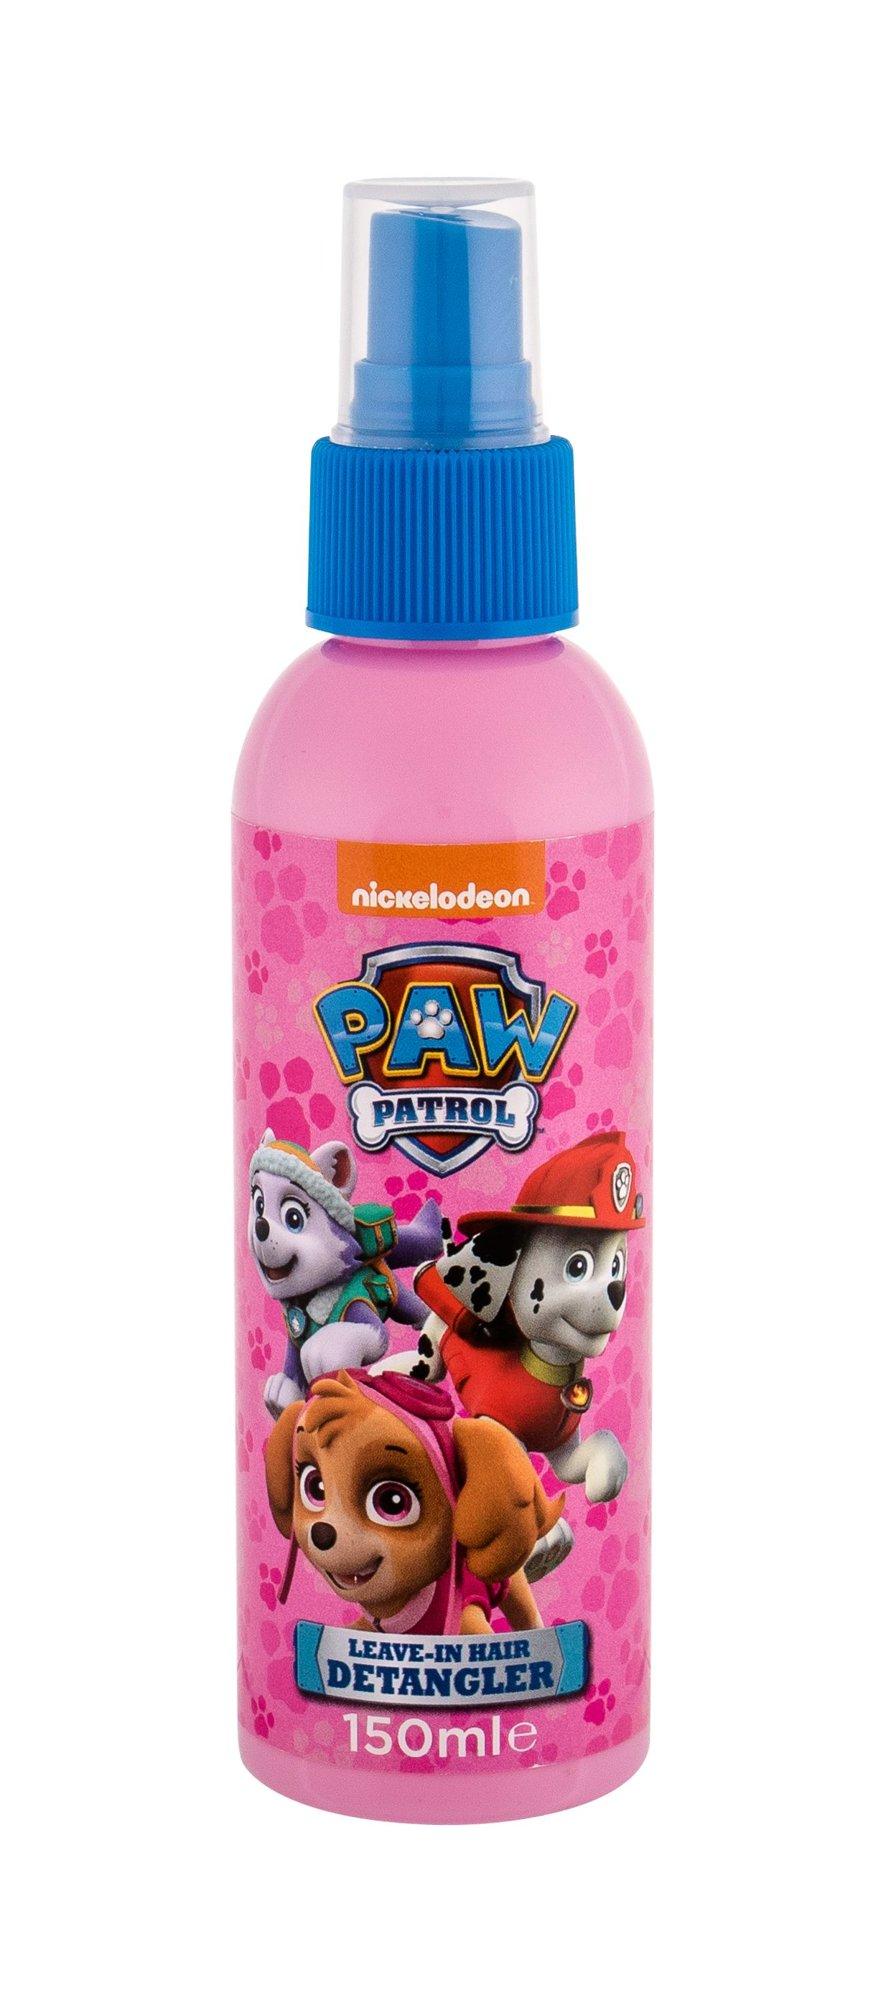 Nickelodeon Paw Patrol Conditioner 150ml